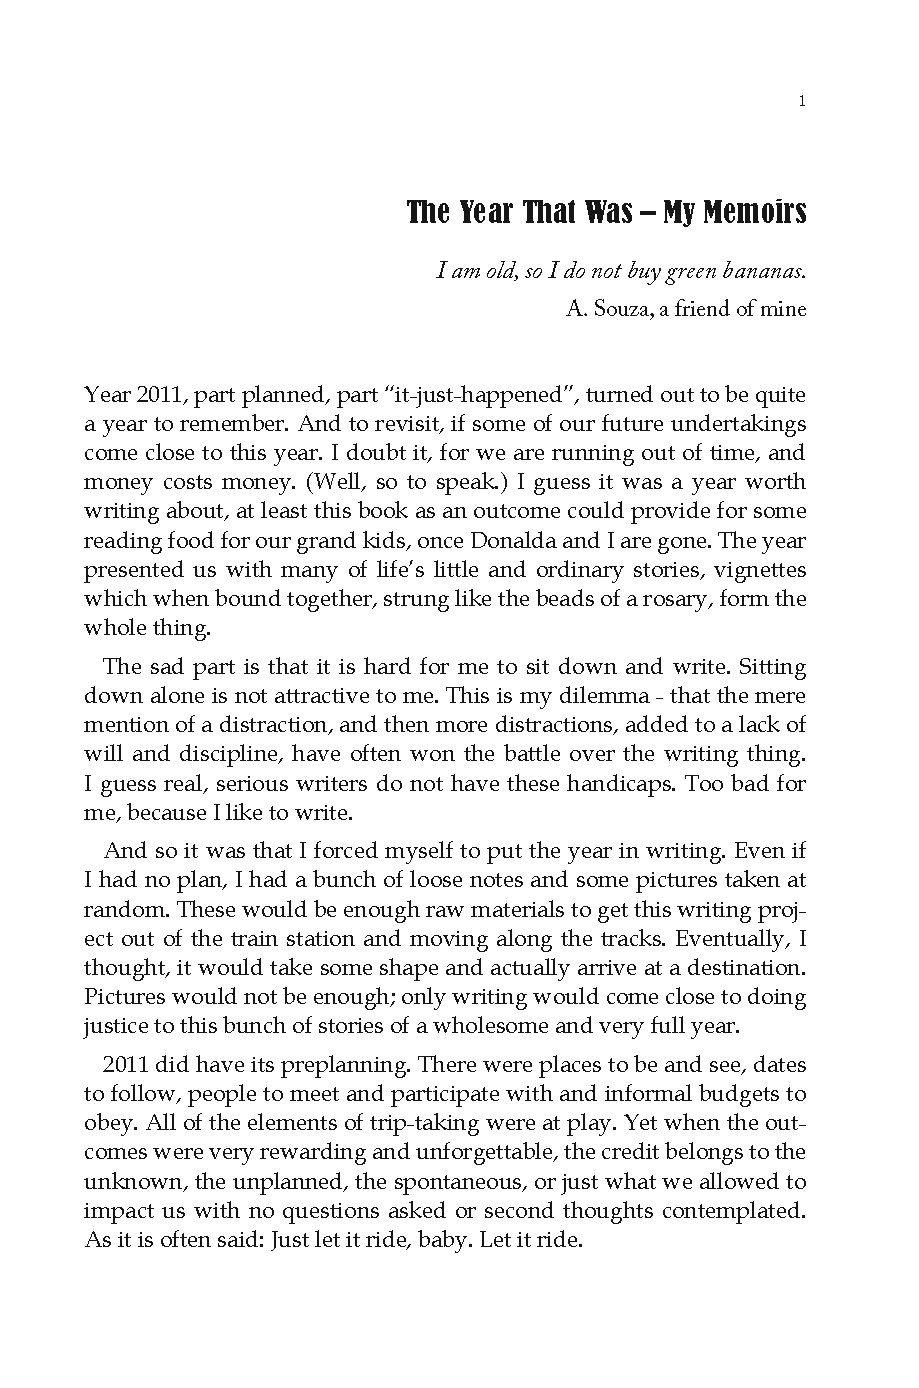 binder6_page_06.jpg